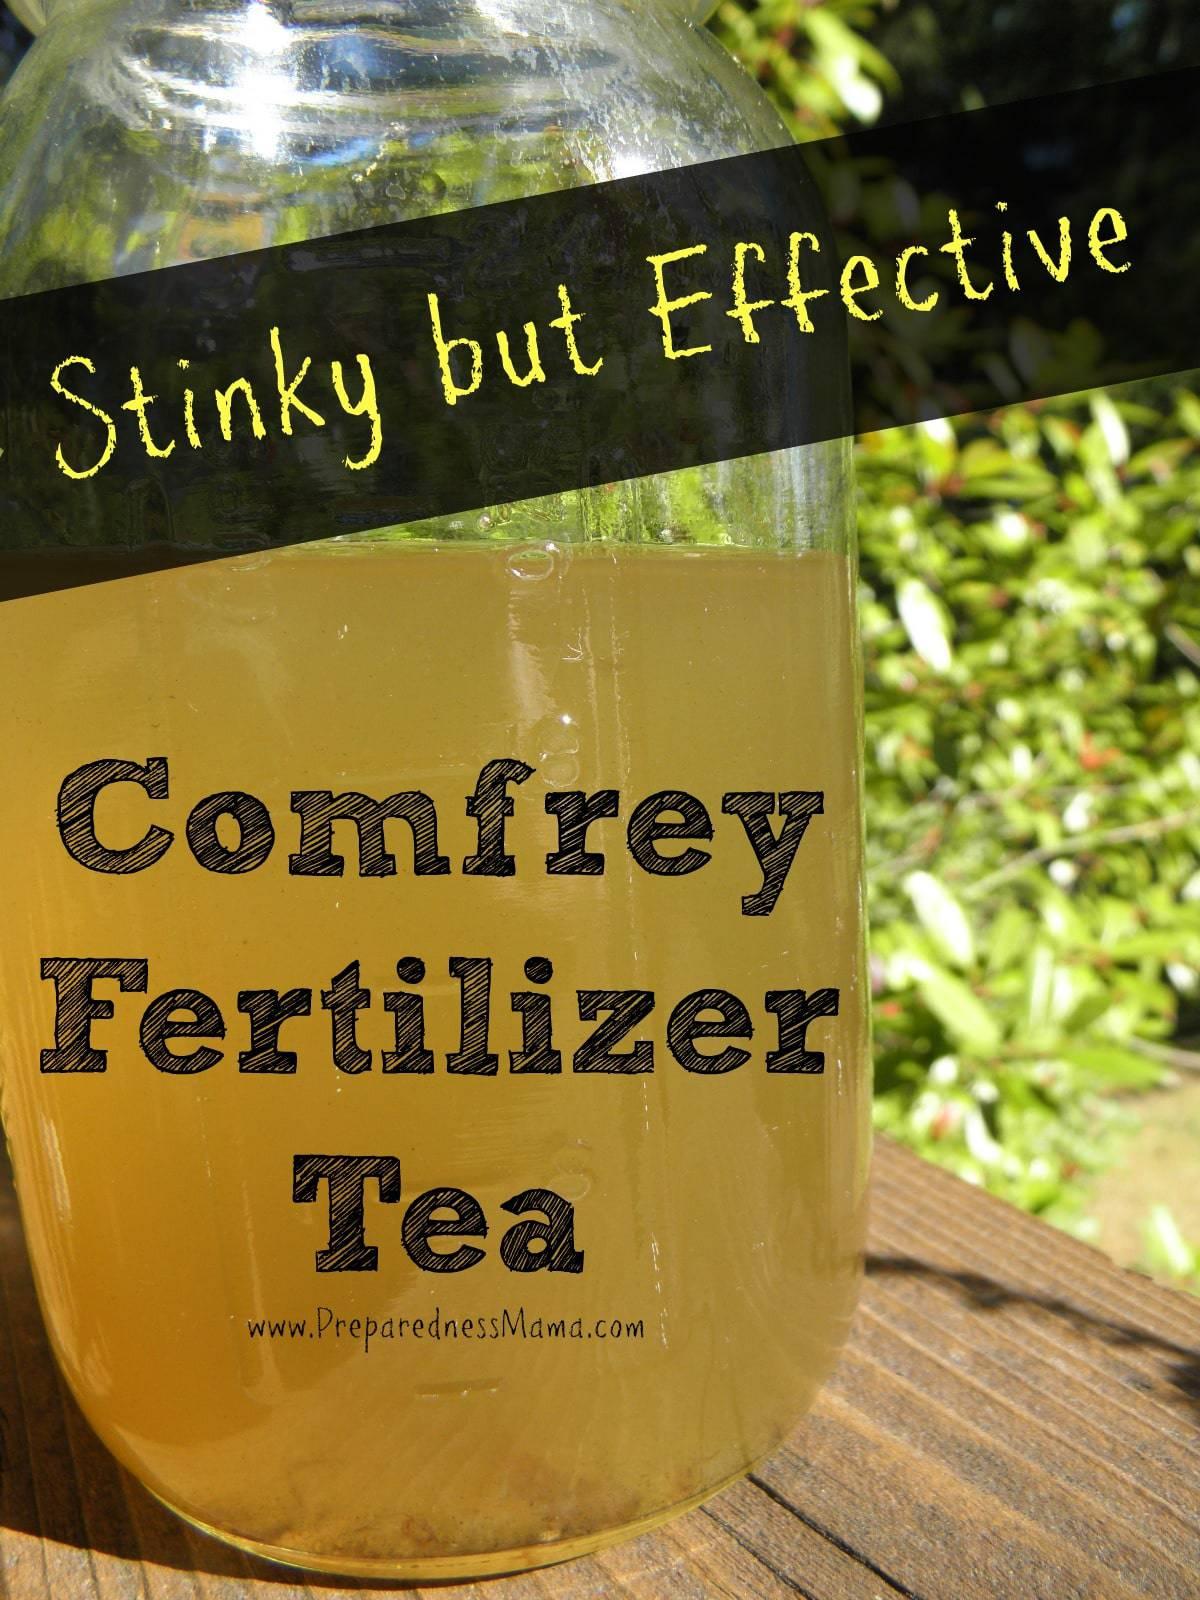 Stinky But Effective Make Comfrey Fertilizer Tea